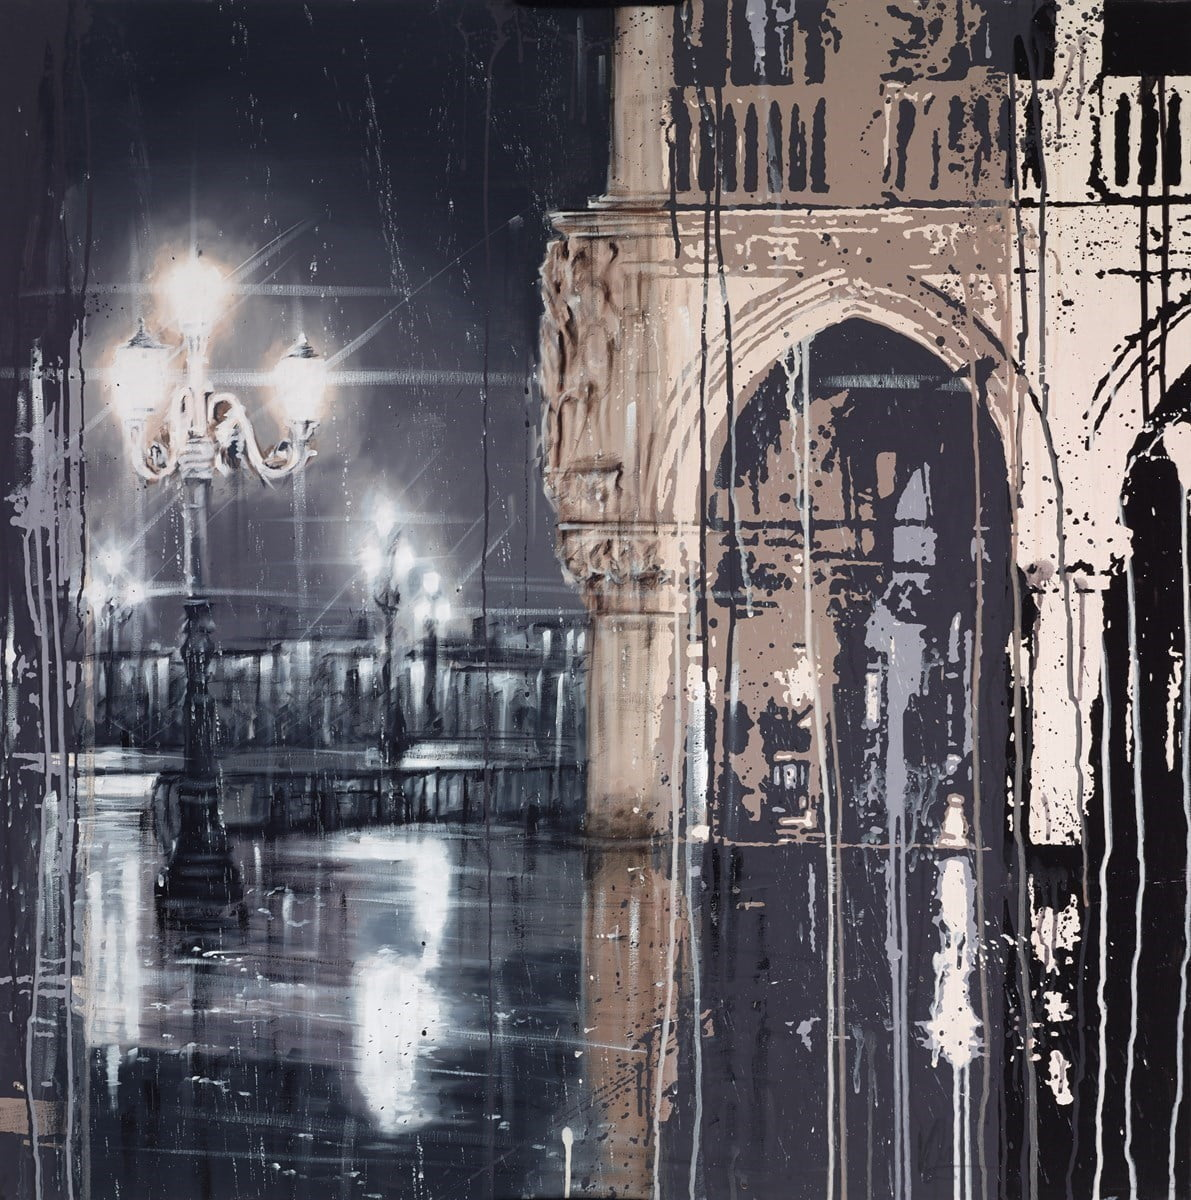 Venice Rain at Night ~ Kris Hardy